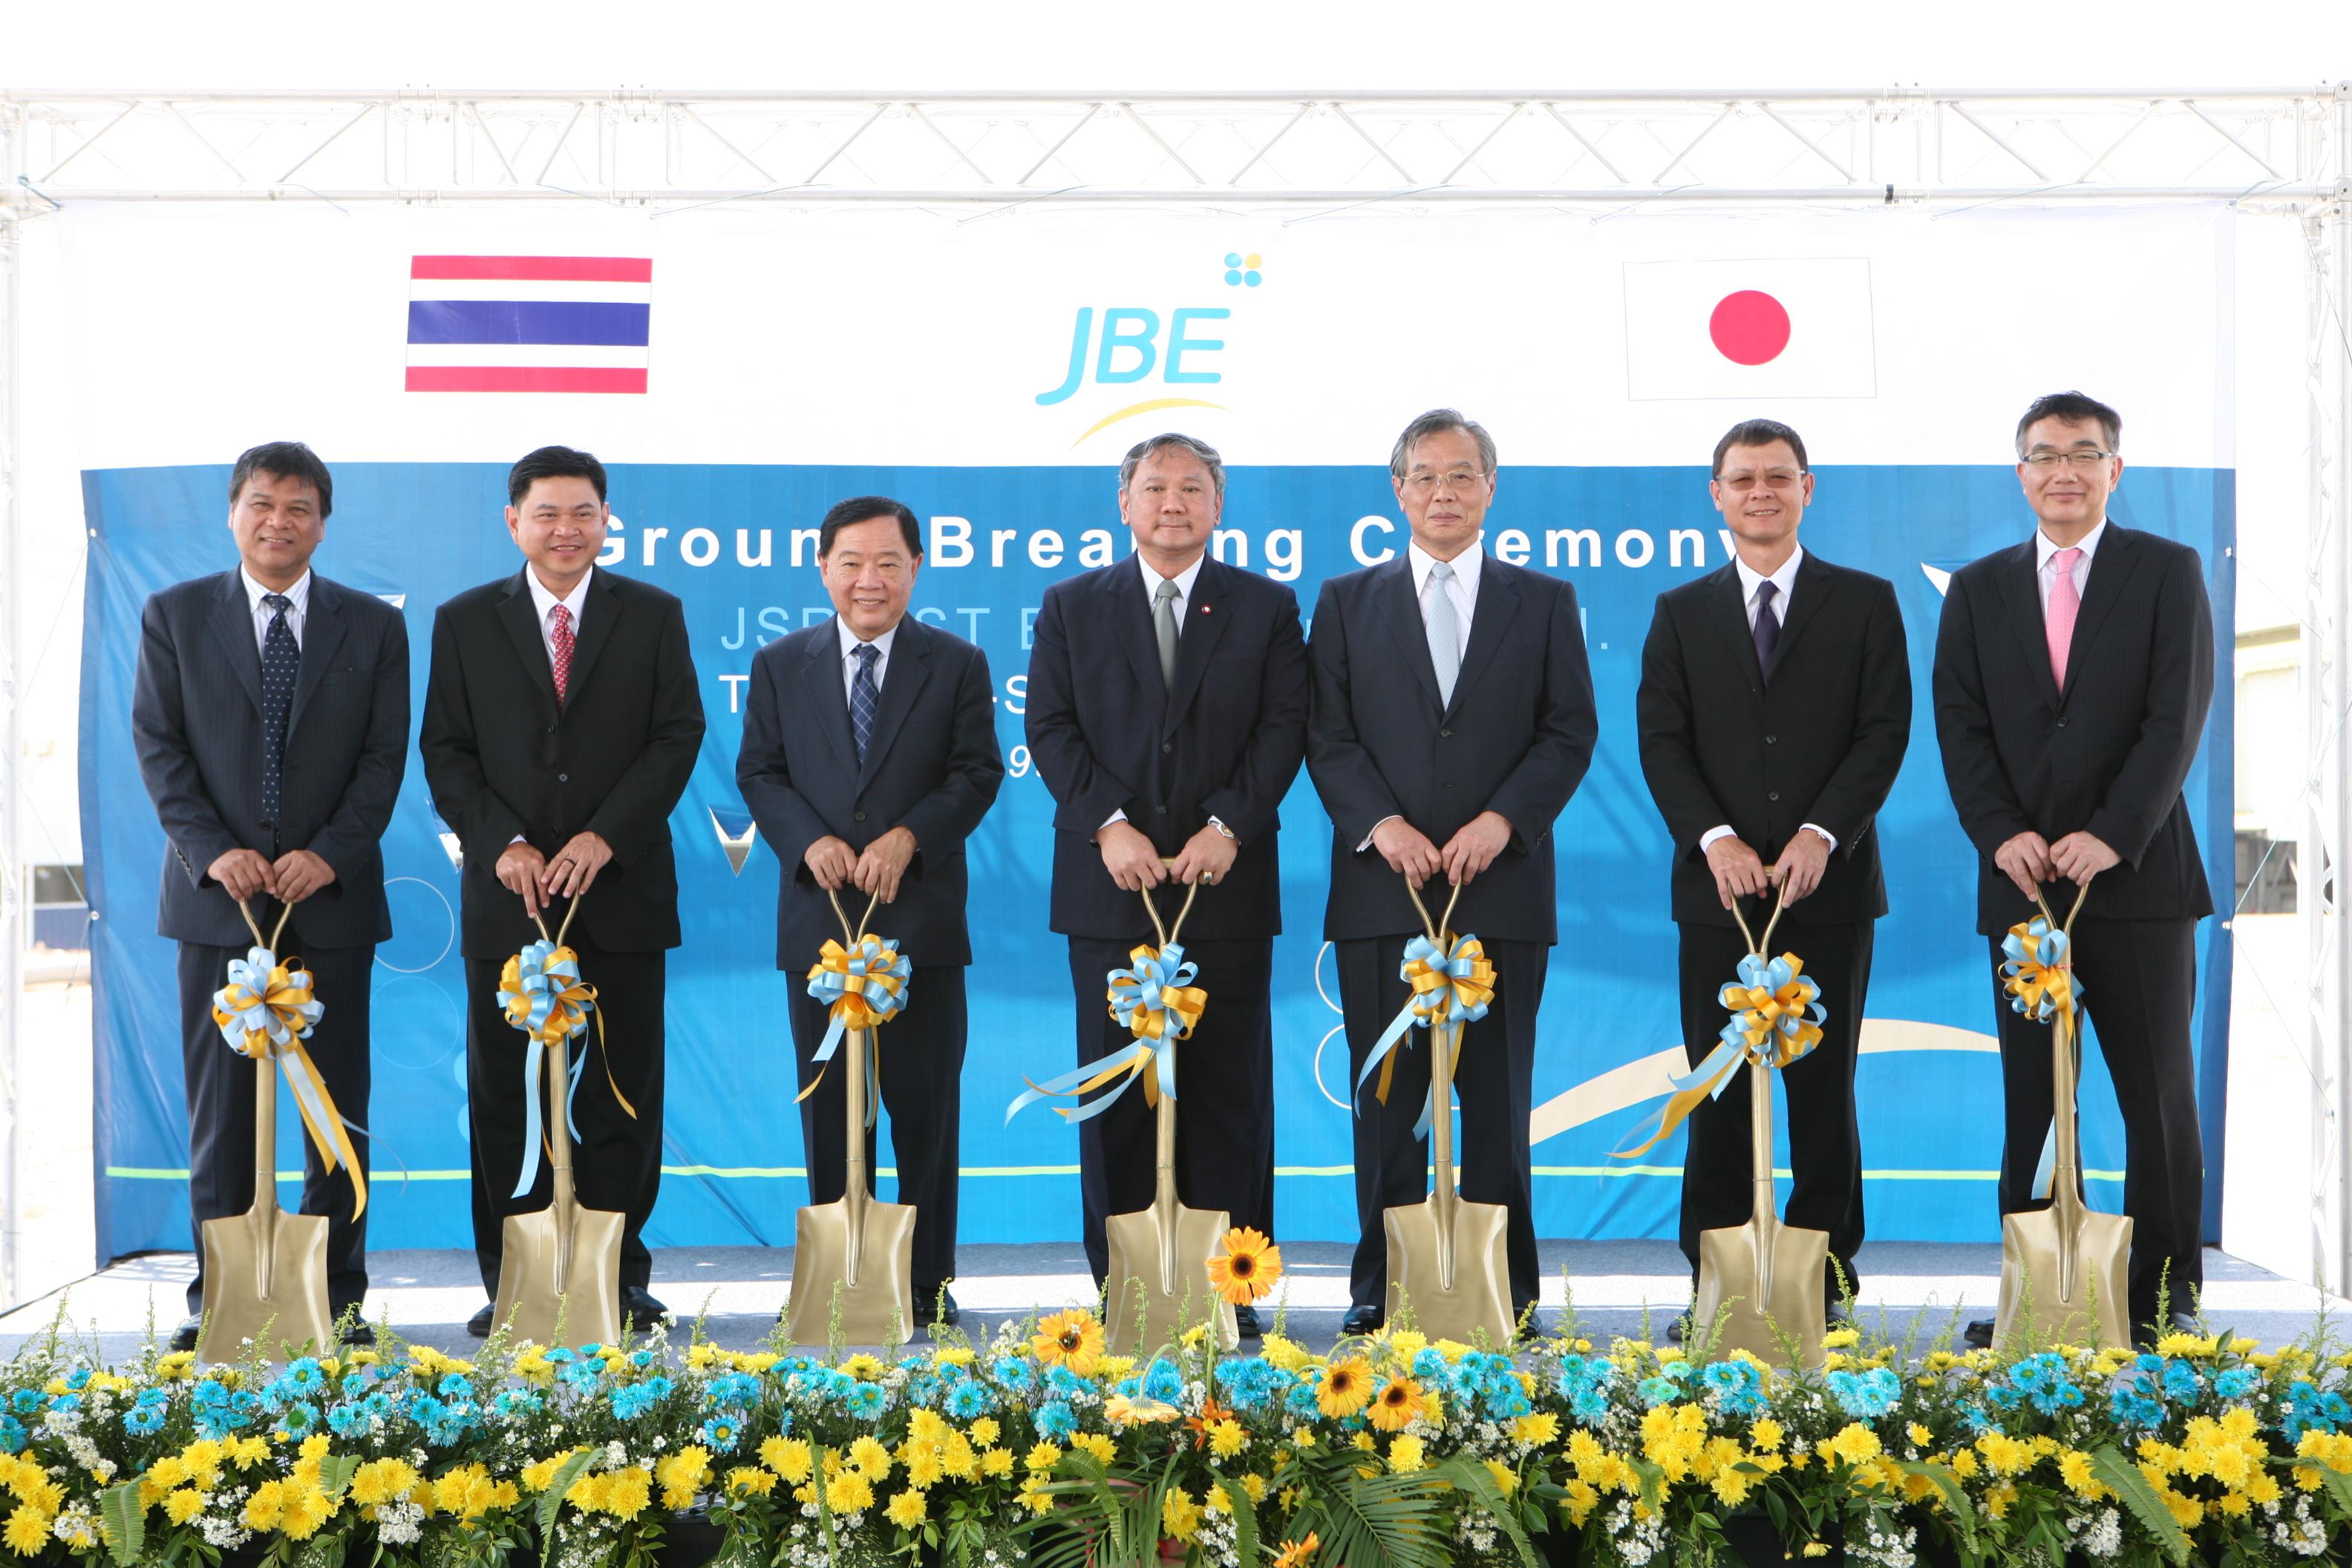 JBE起工式 左から2人目チャカラ タイ工業団地公社副総裁、3人目ピチット BST社長、4人目タワチャイ ラヨン県知事、5人目吉田JSR会長、7人目長友JBE社長